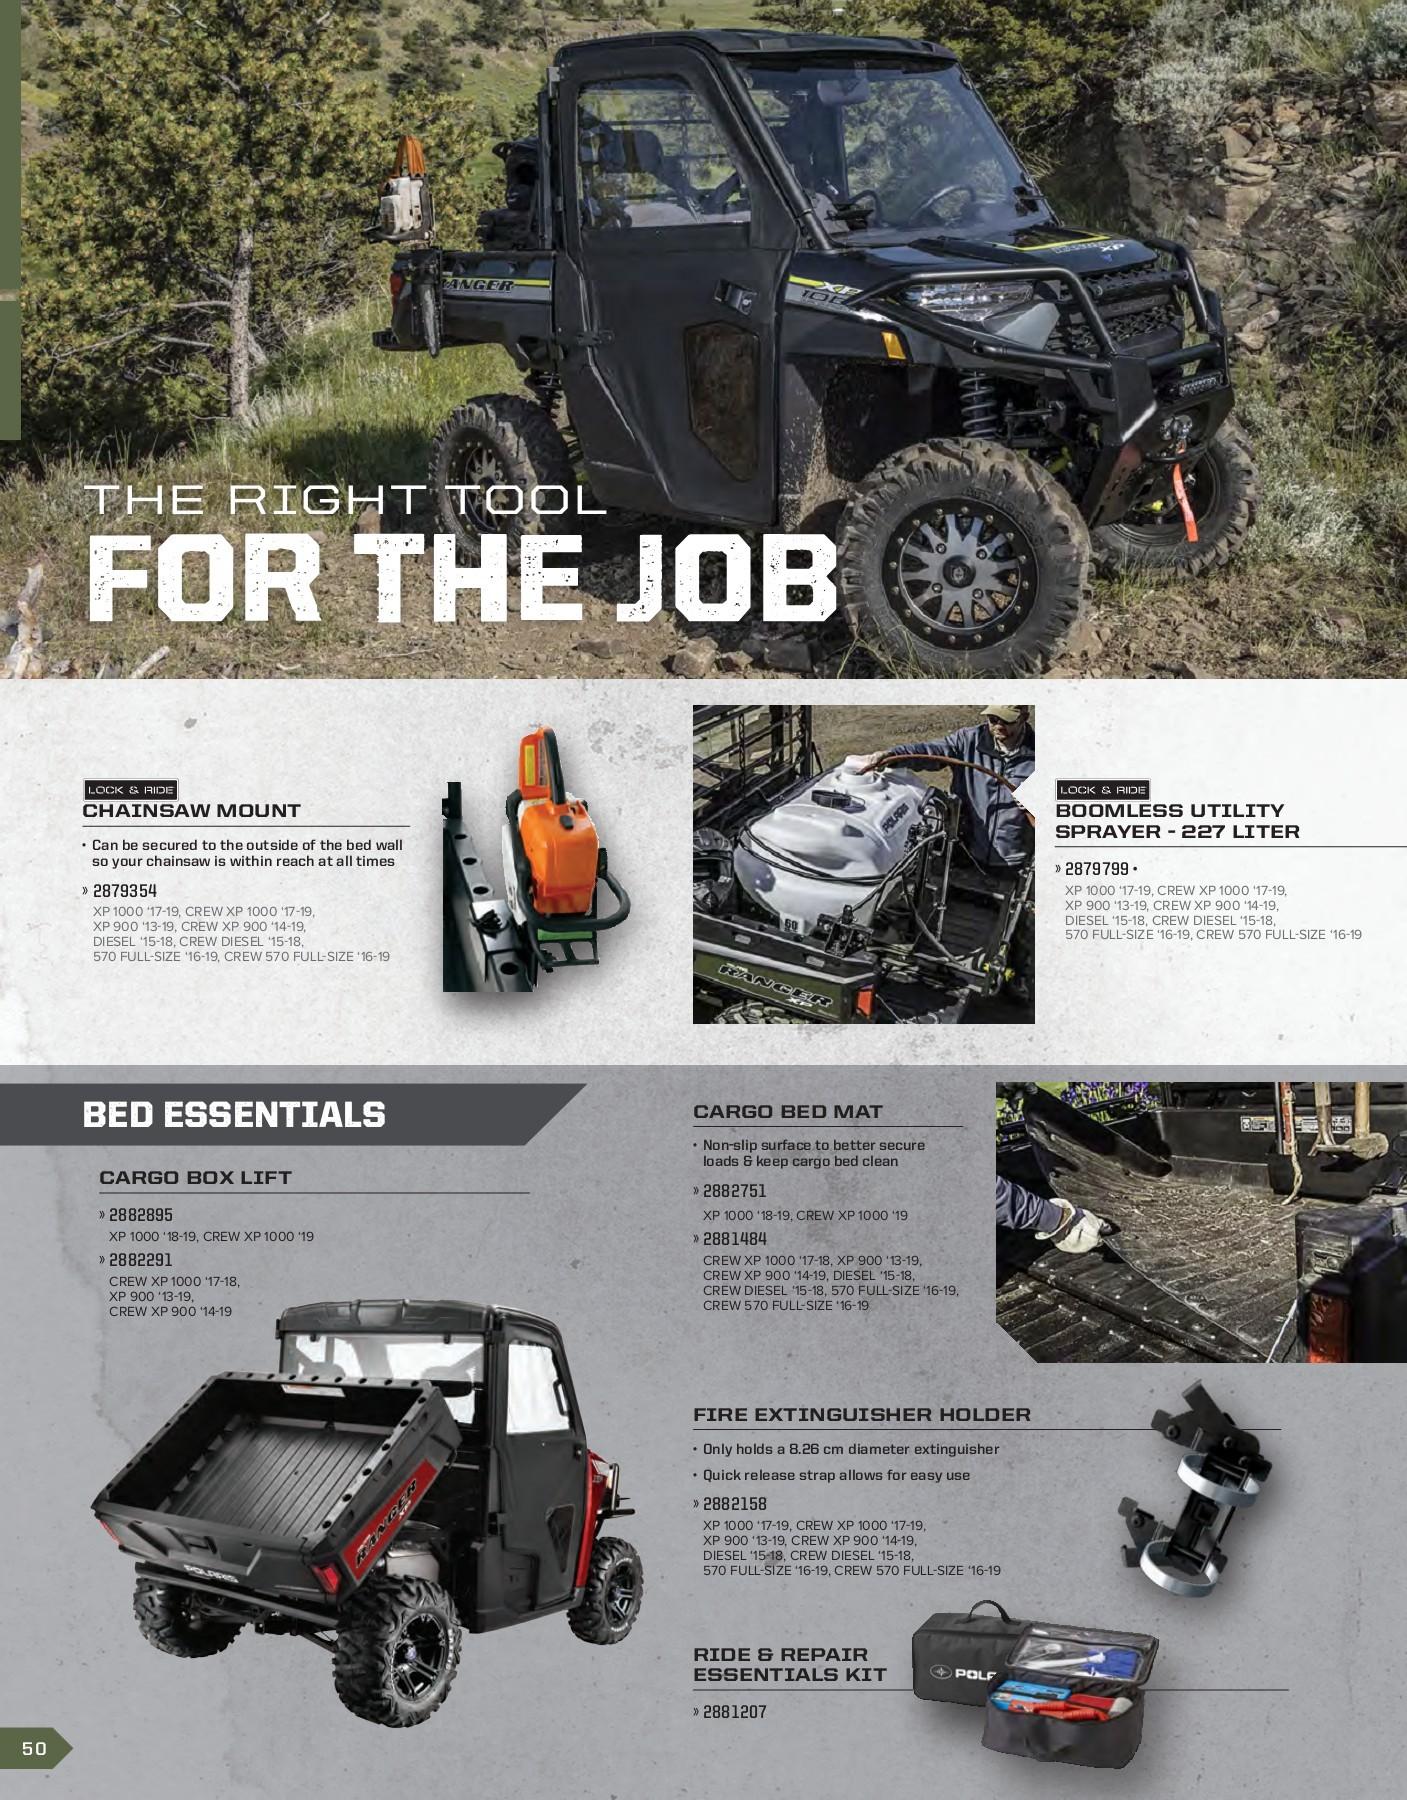 UTV Winch Mount fits 2014-2019 Polaris 570-4 Ranger Midsize 4x4 Crew